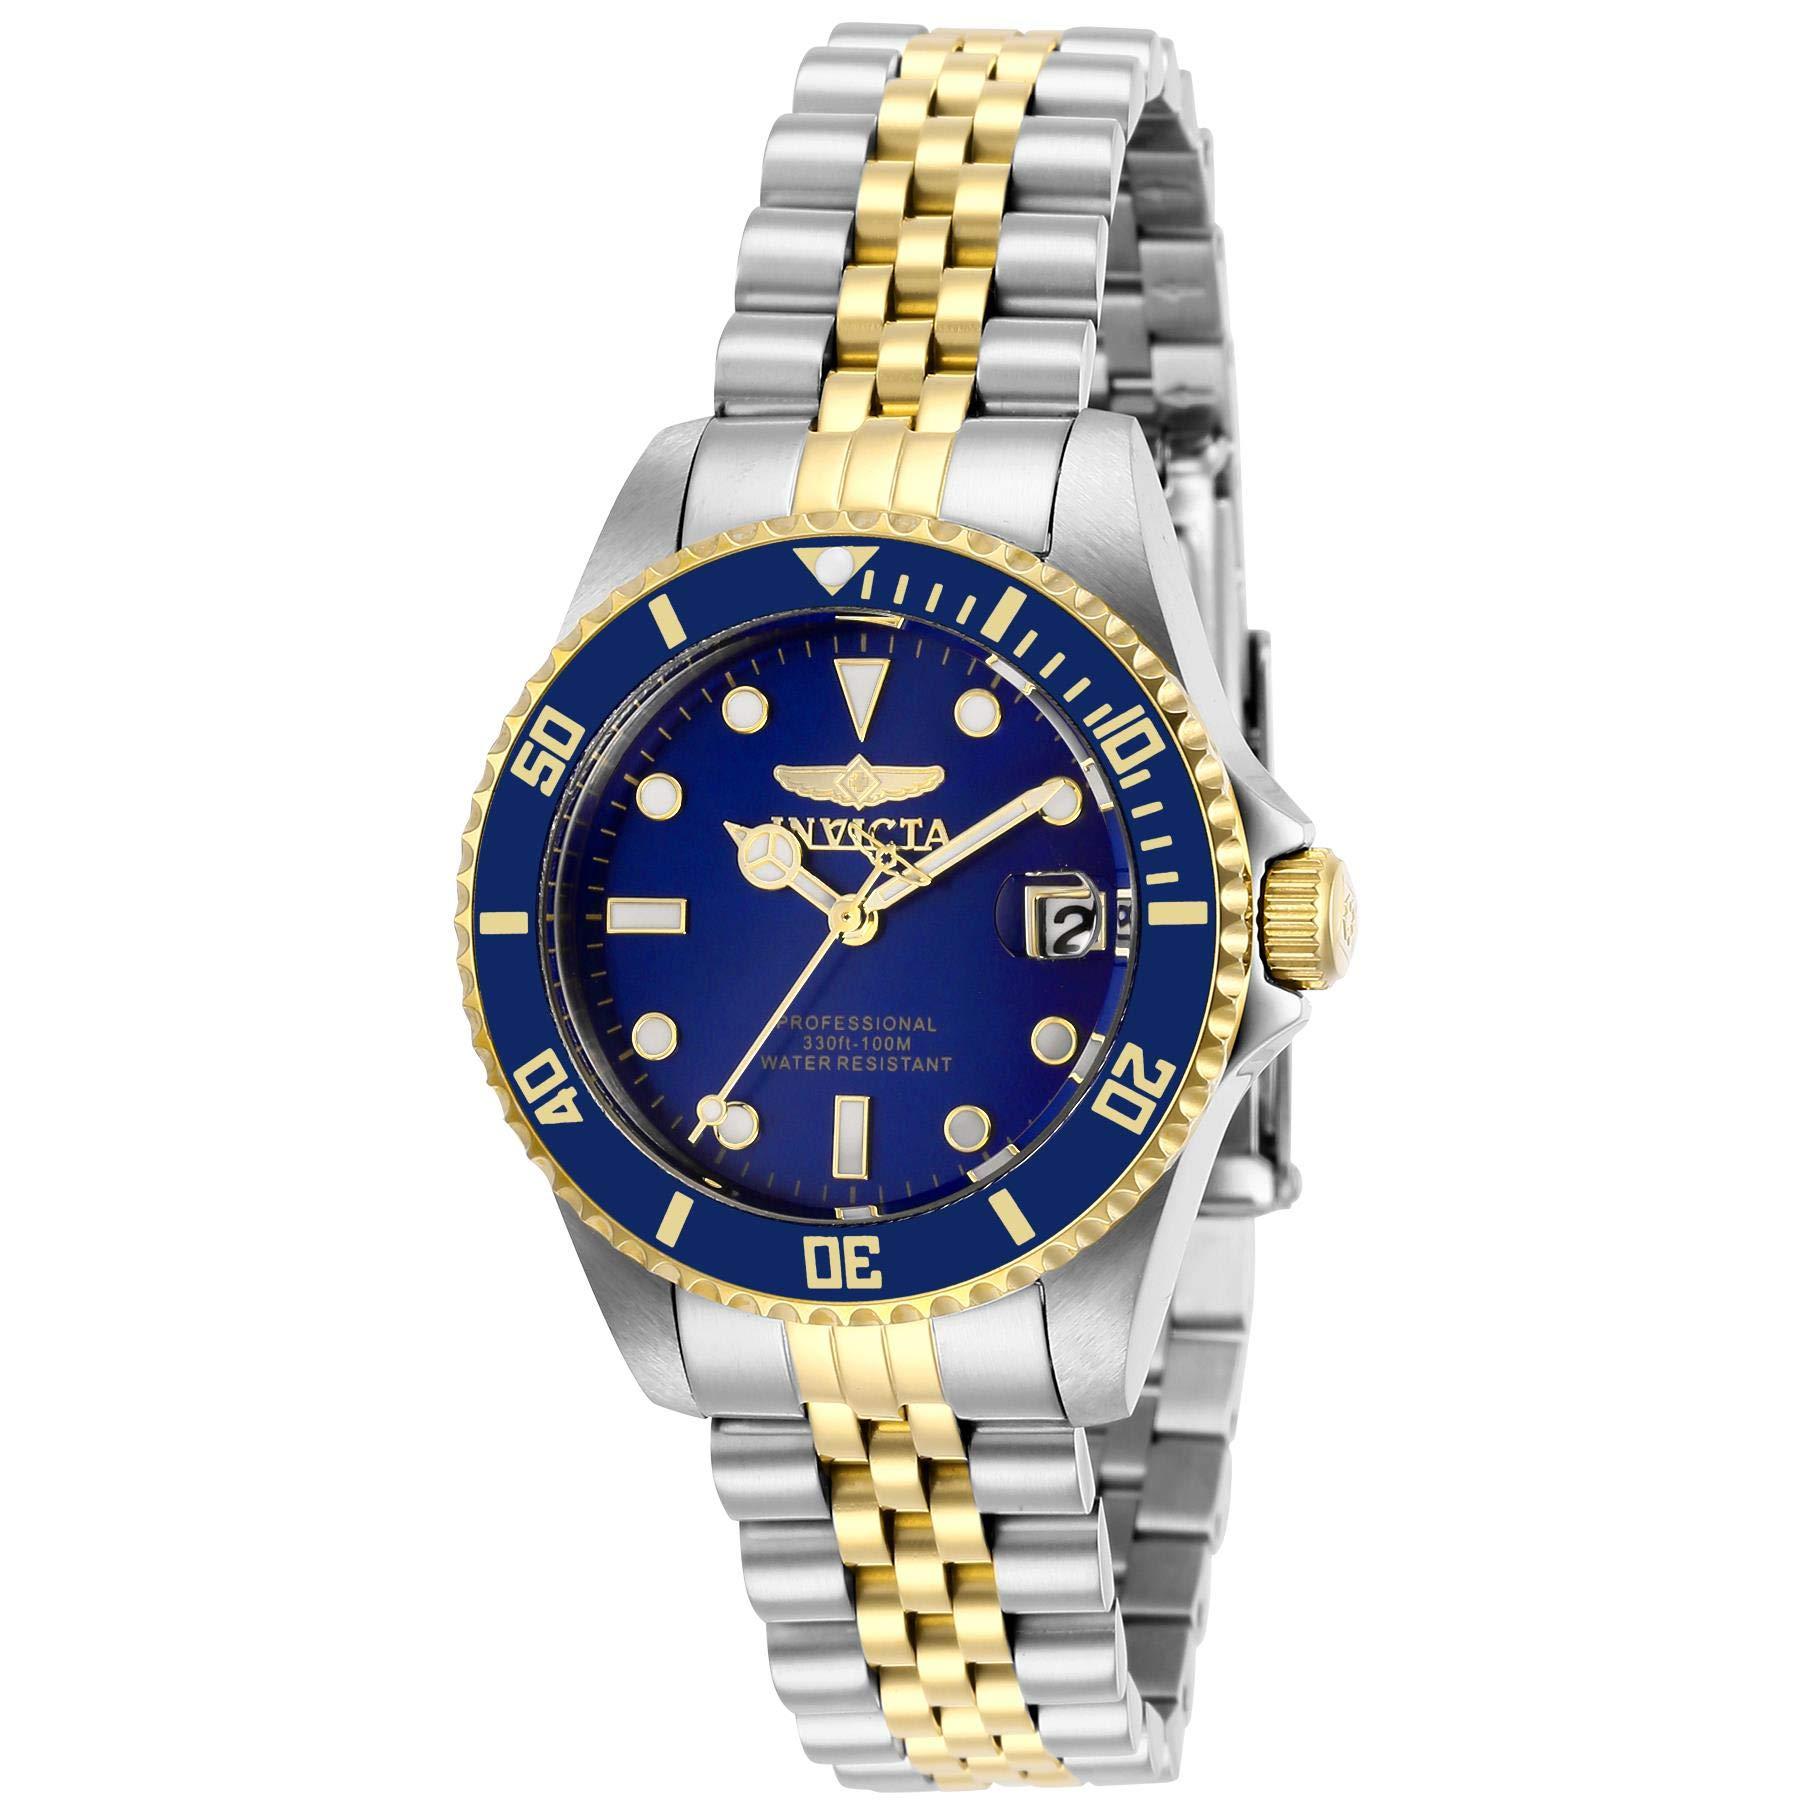 Invicta-PRO-Diver-Damen-Armbanduhr-Armband-Edelstahl-Gehuse-Quarz-29188